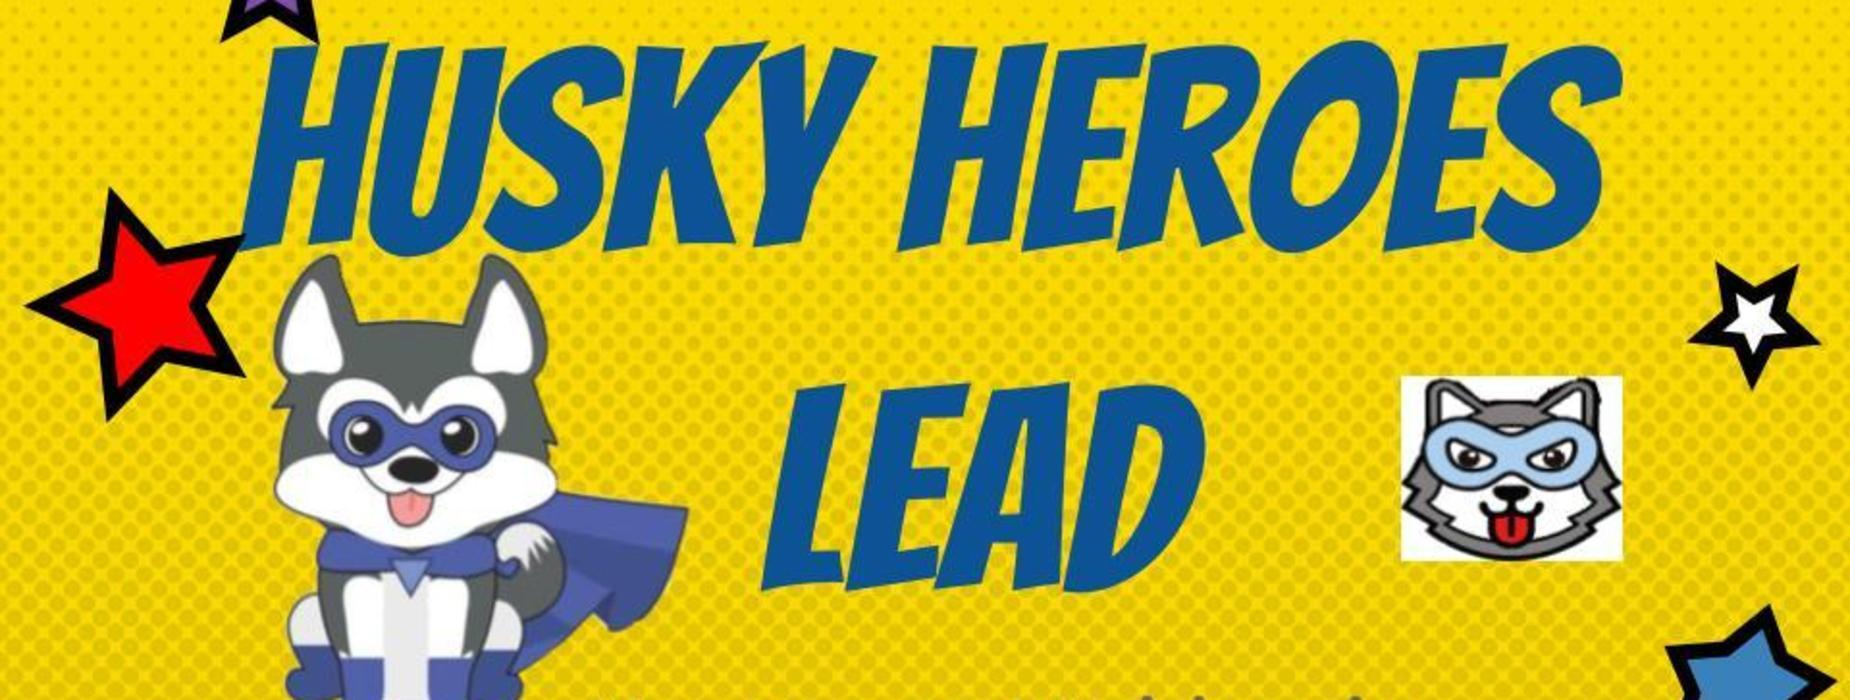 Husky Heroes Lead